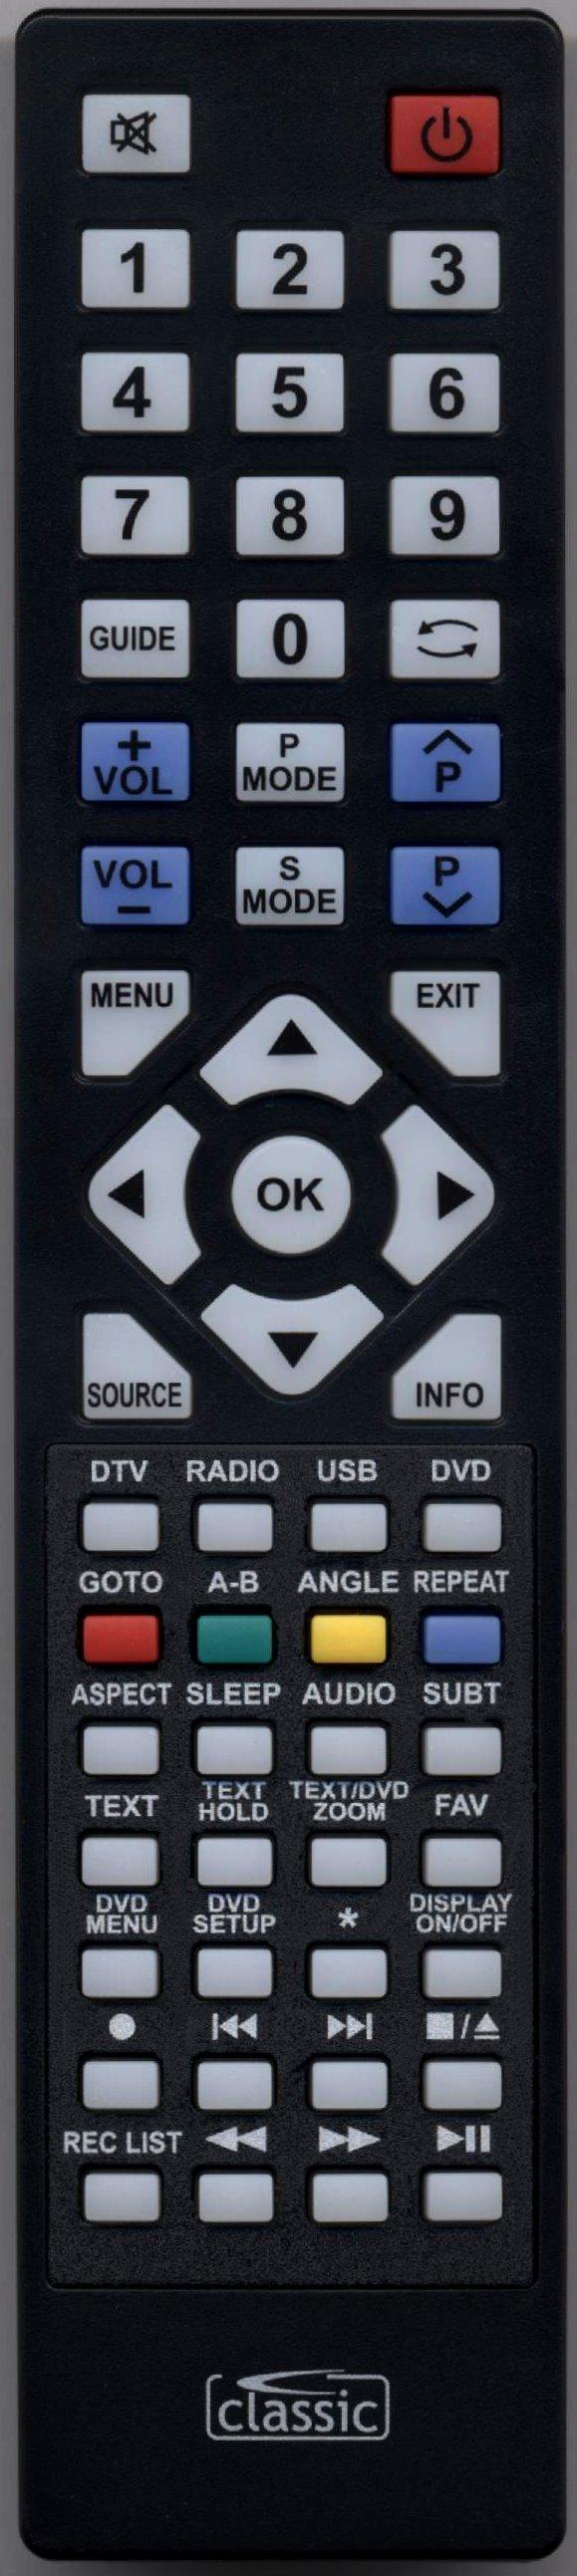 Blaupunkt 23-157I-GW-3W-HBKDUP-UK Remote Control